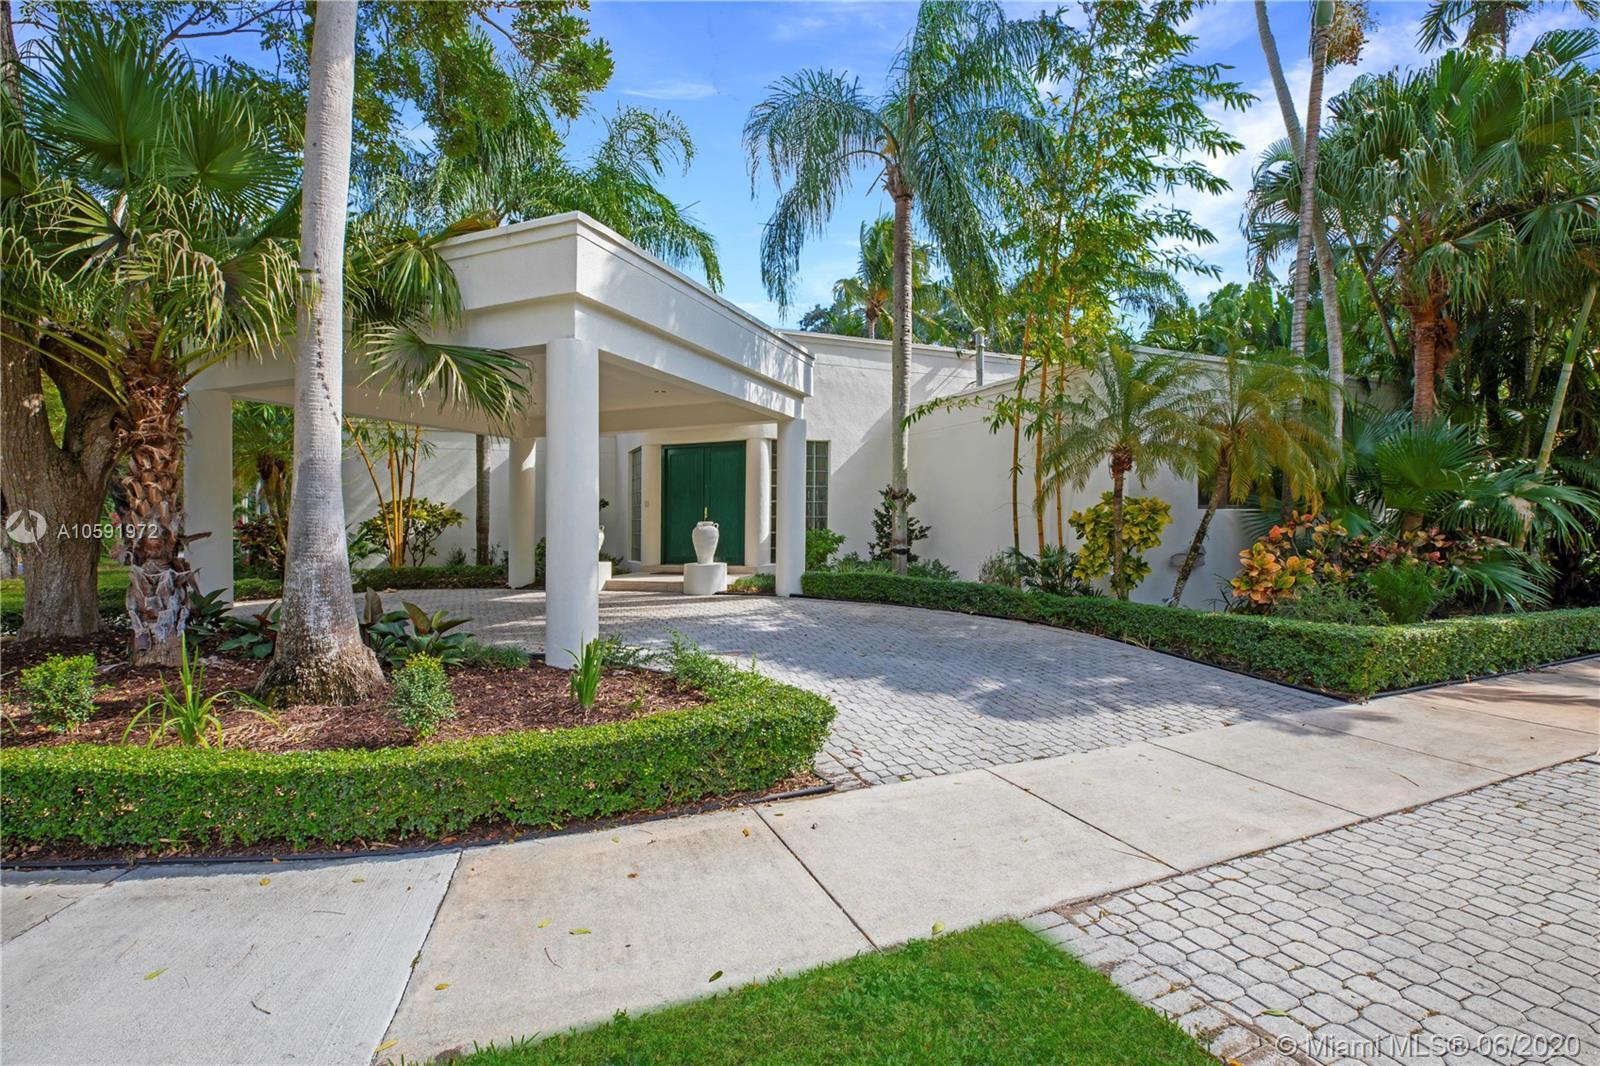 4020 Hardie Ave, Coconut Grove, FL 33133